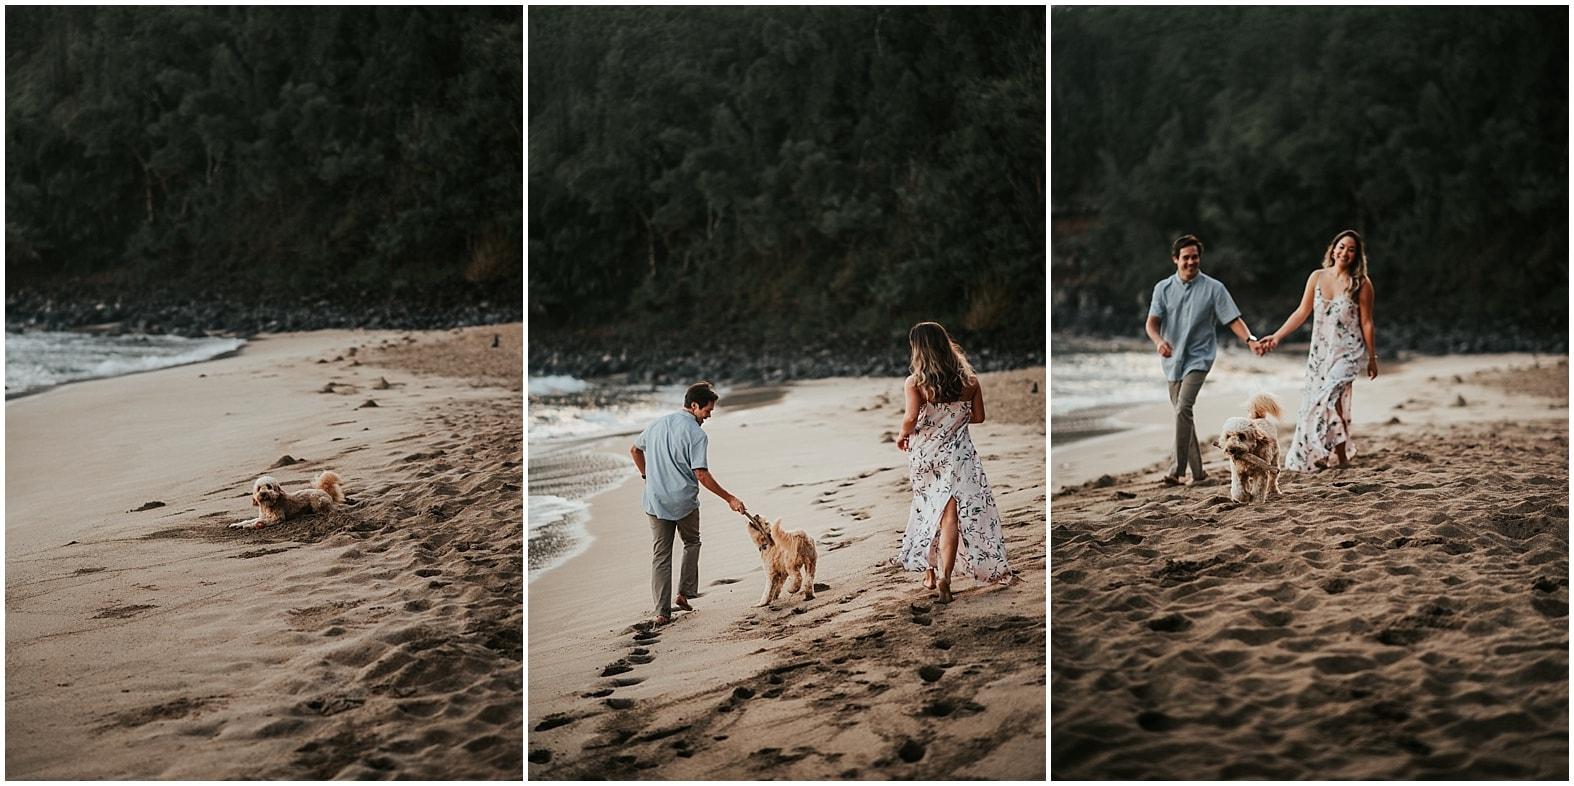 MAui engagement photography Rodrigo_Moraes_Photography10